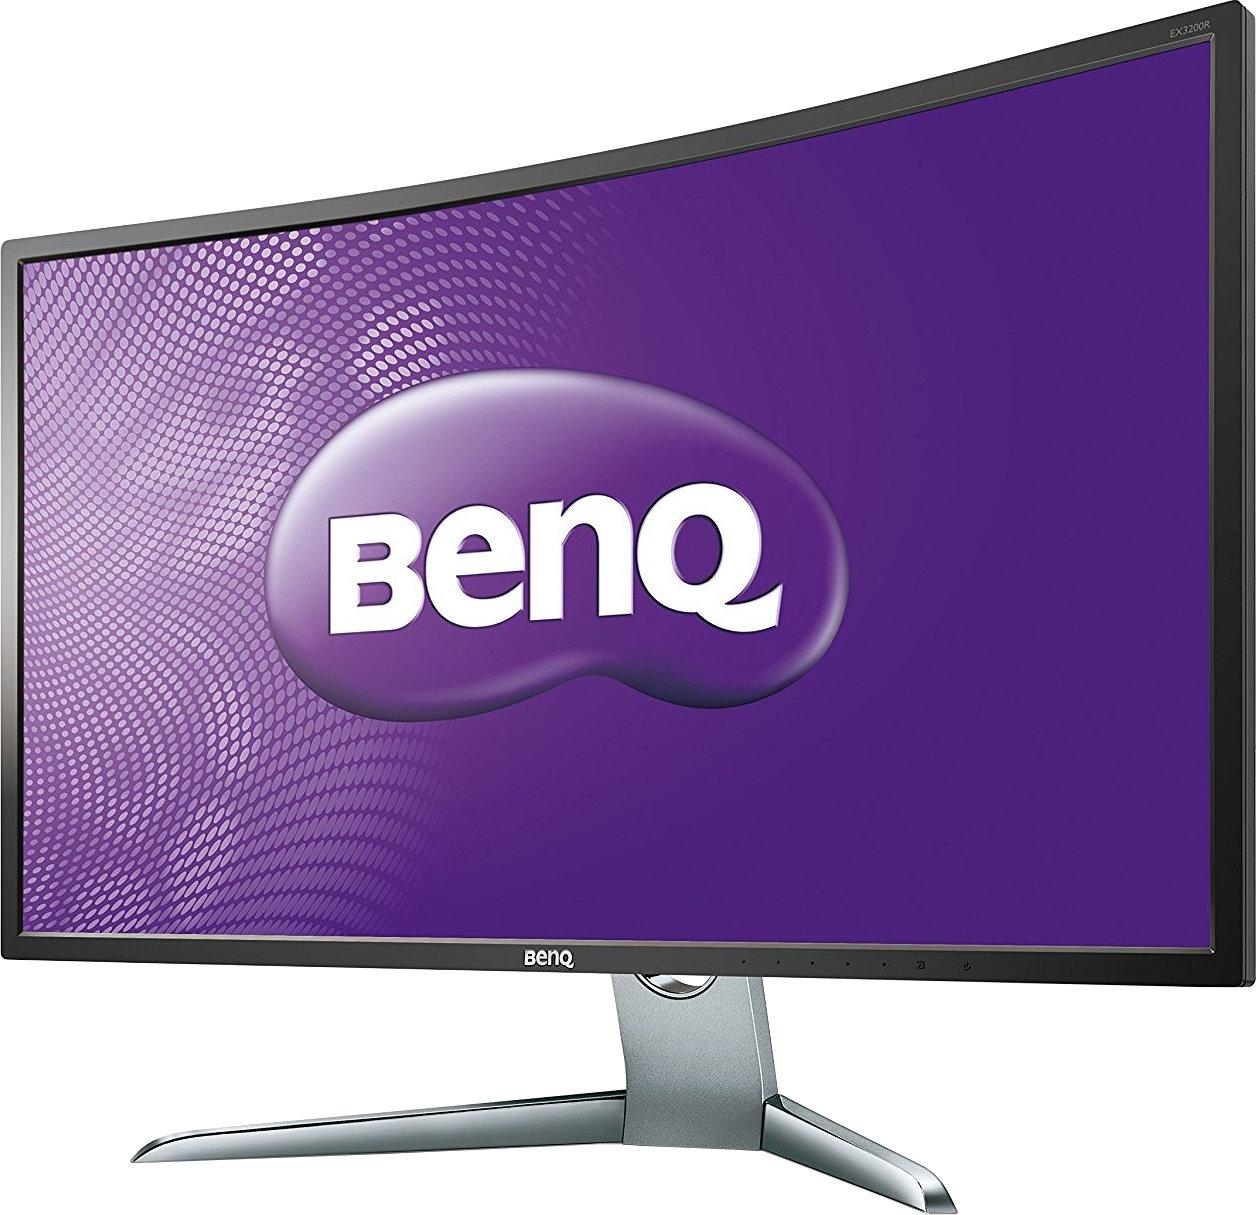 [Notebooksbilliger] BENQ EX3200R 31.5 Zoll Full-HD Monitor (1x HDMI, 1x DisplayPort 1.2, 1x mini DisplayPort Kanäle, 4 ms Reaktionszeit) ab 379,05€ Versandkostenfrei (Mit Masterpass)